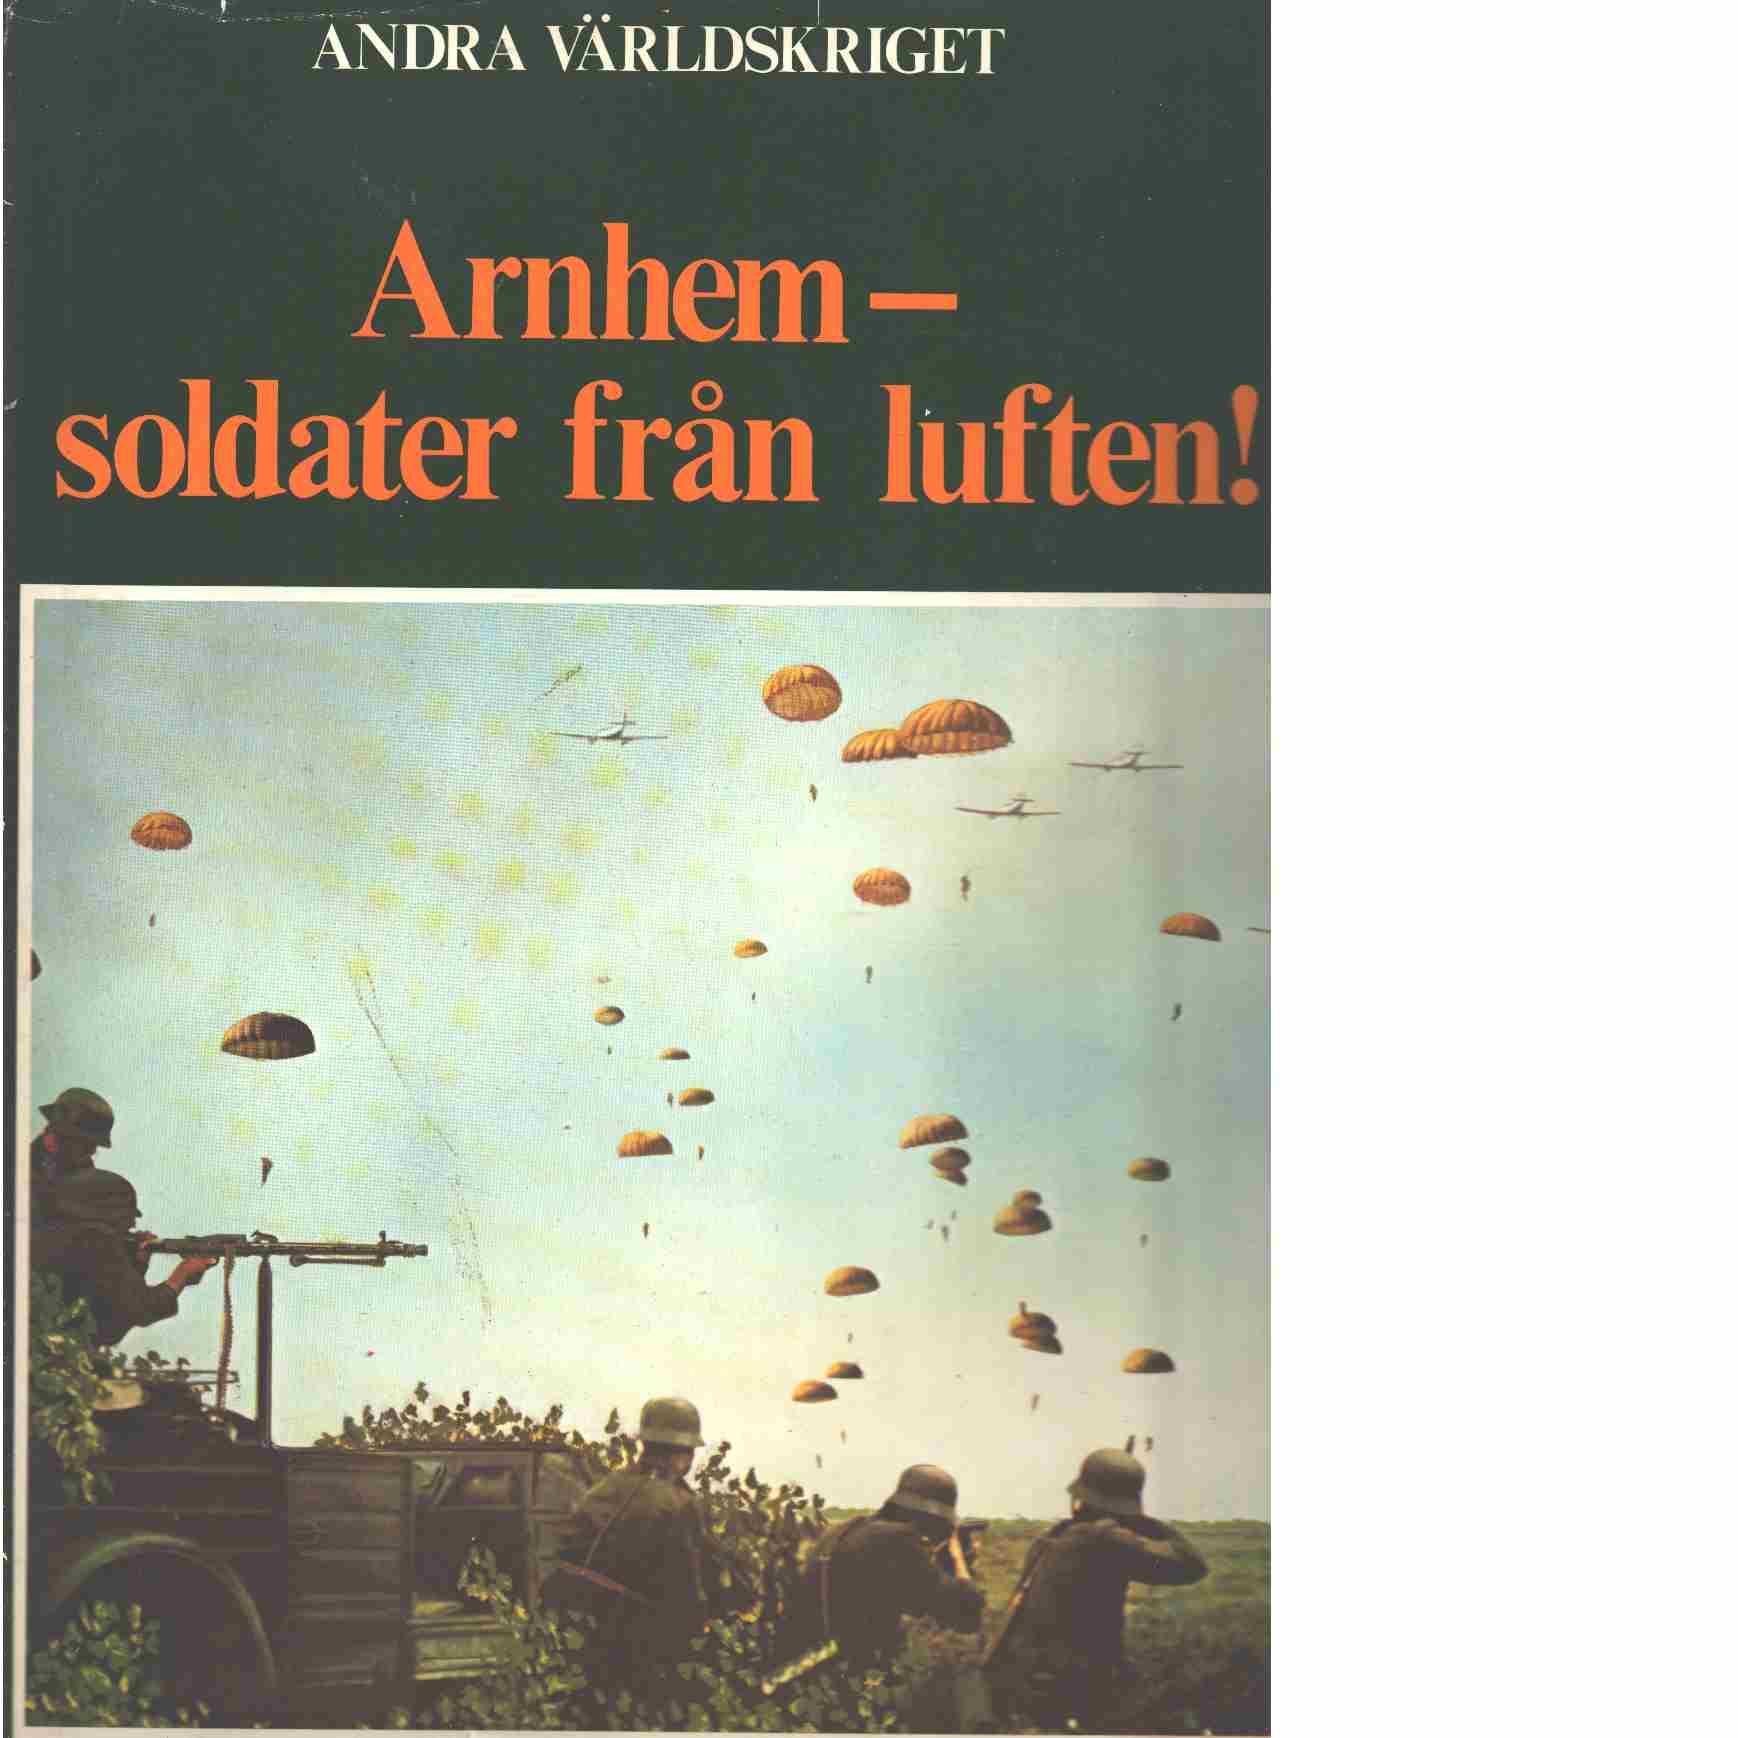 Arnhem - soldater från luften! - Bauer, Eddy